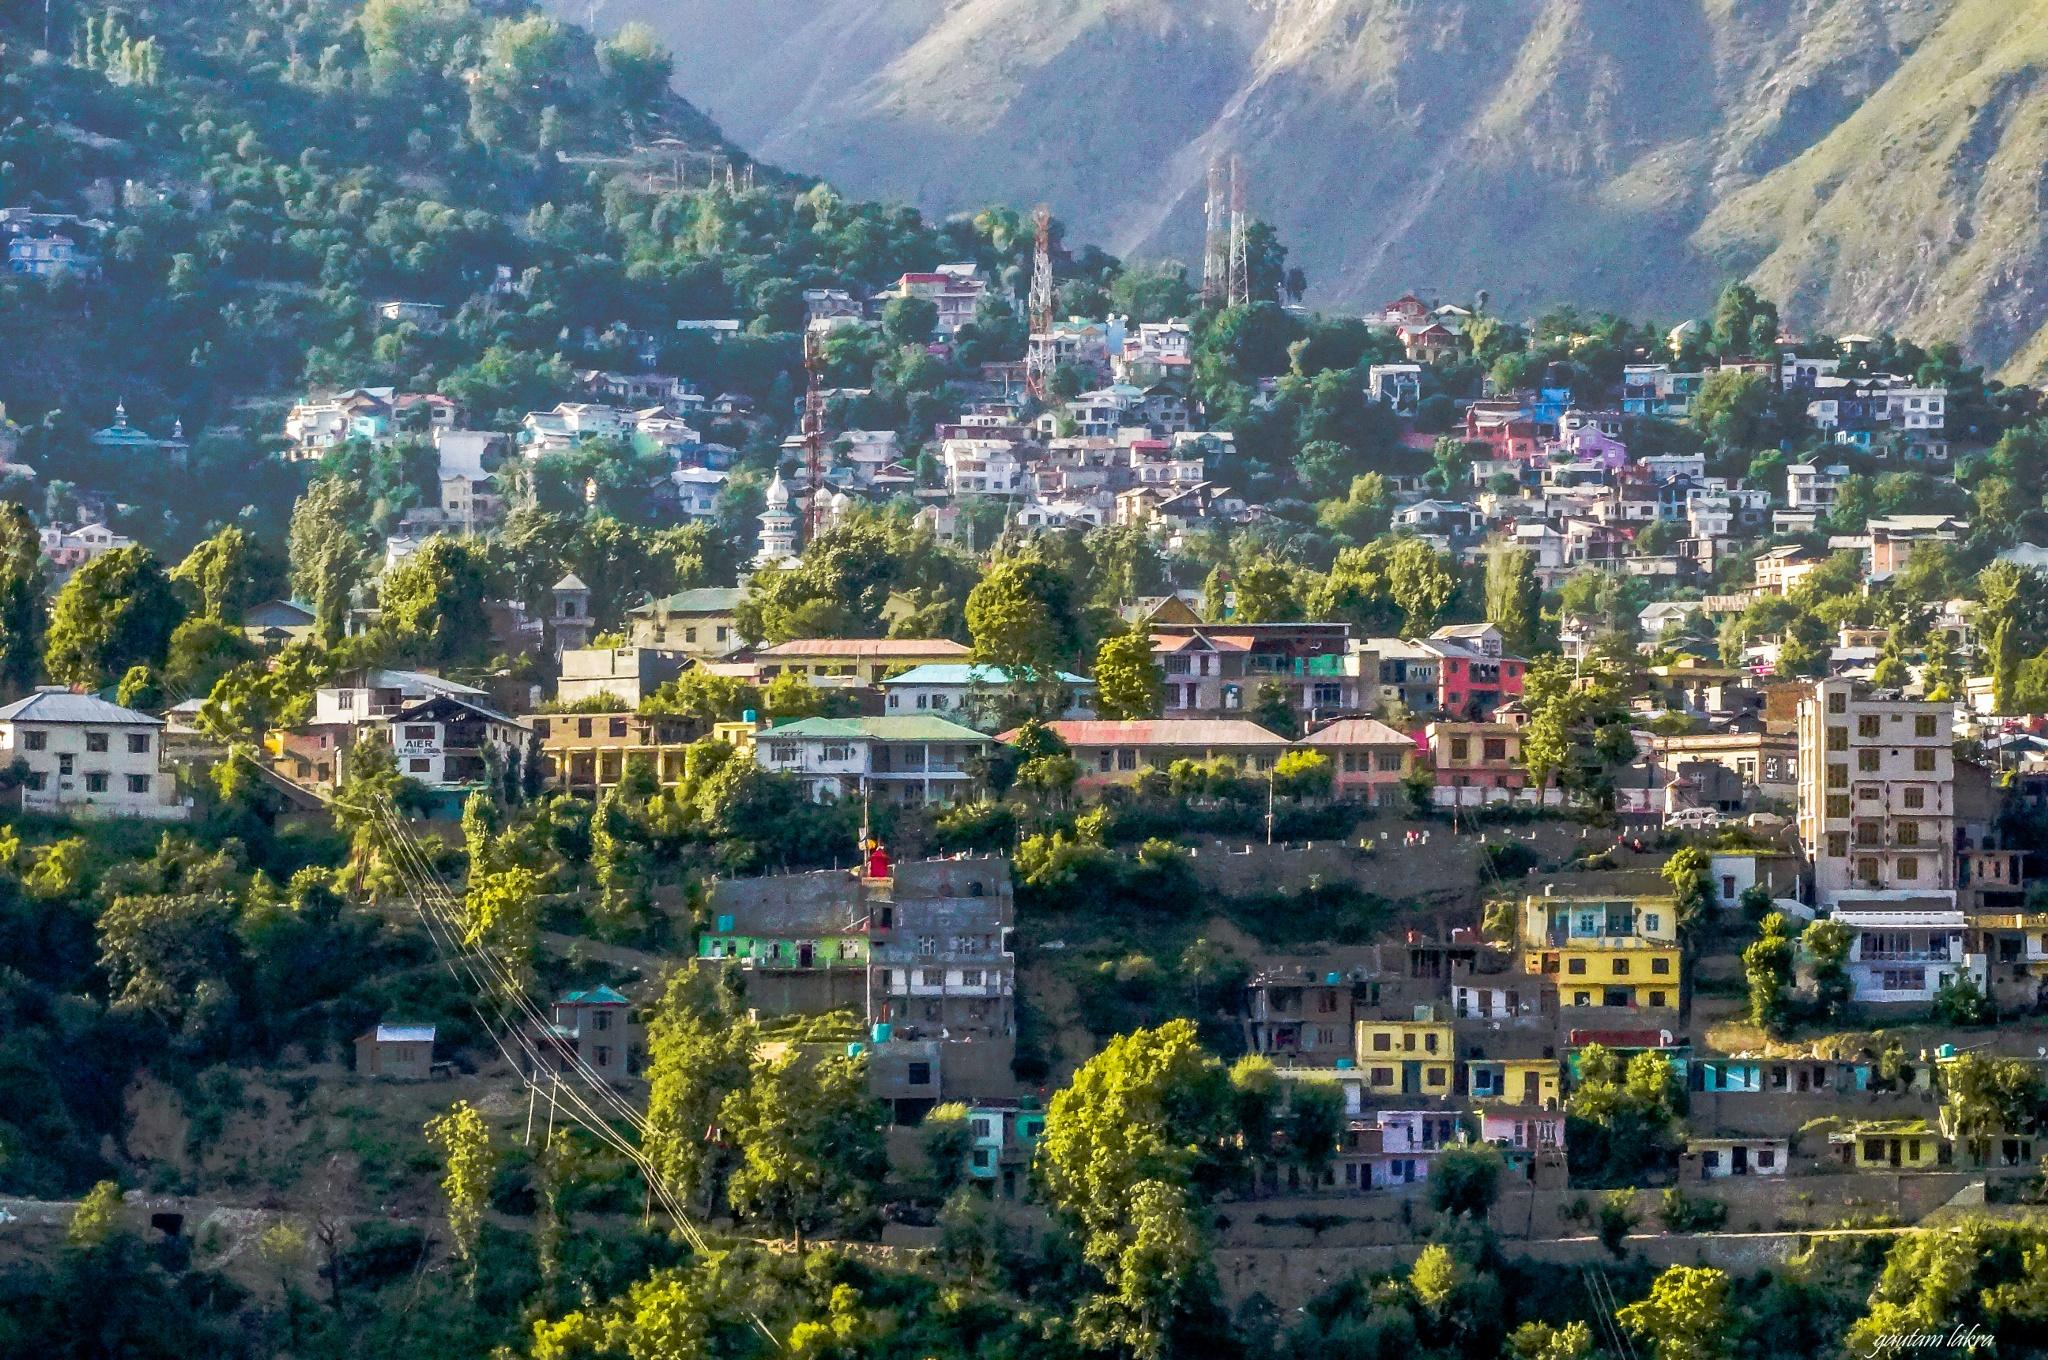 Himalyan hill town by gautamlakra